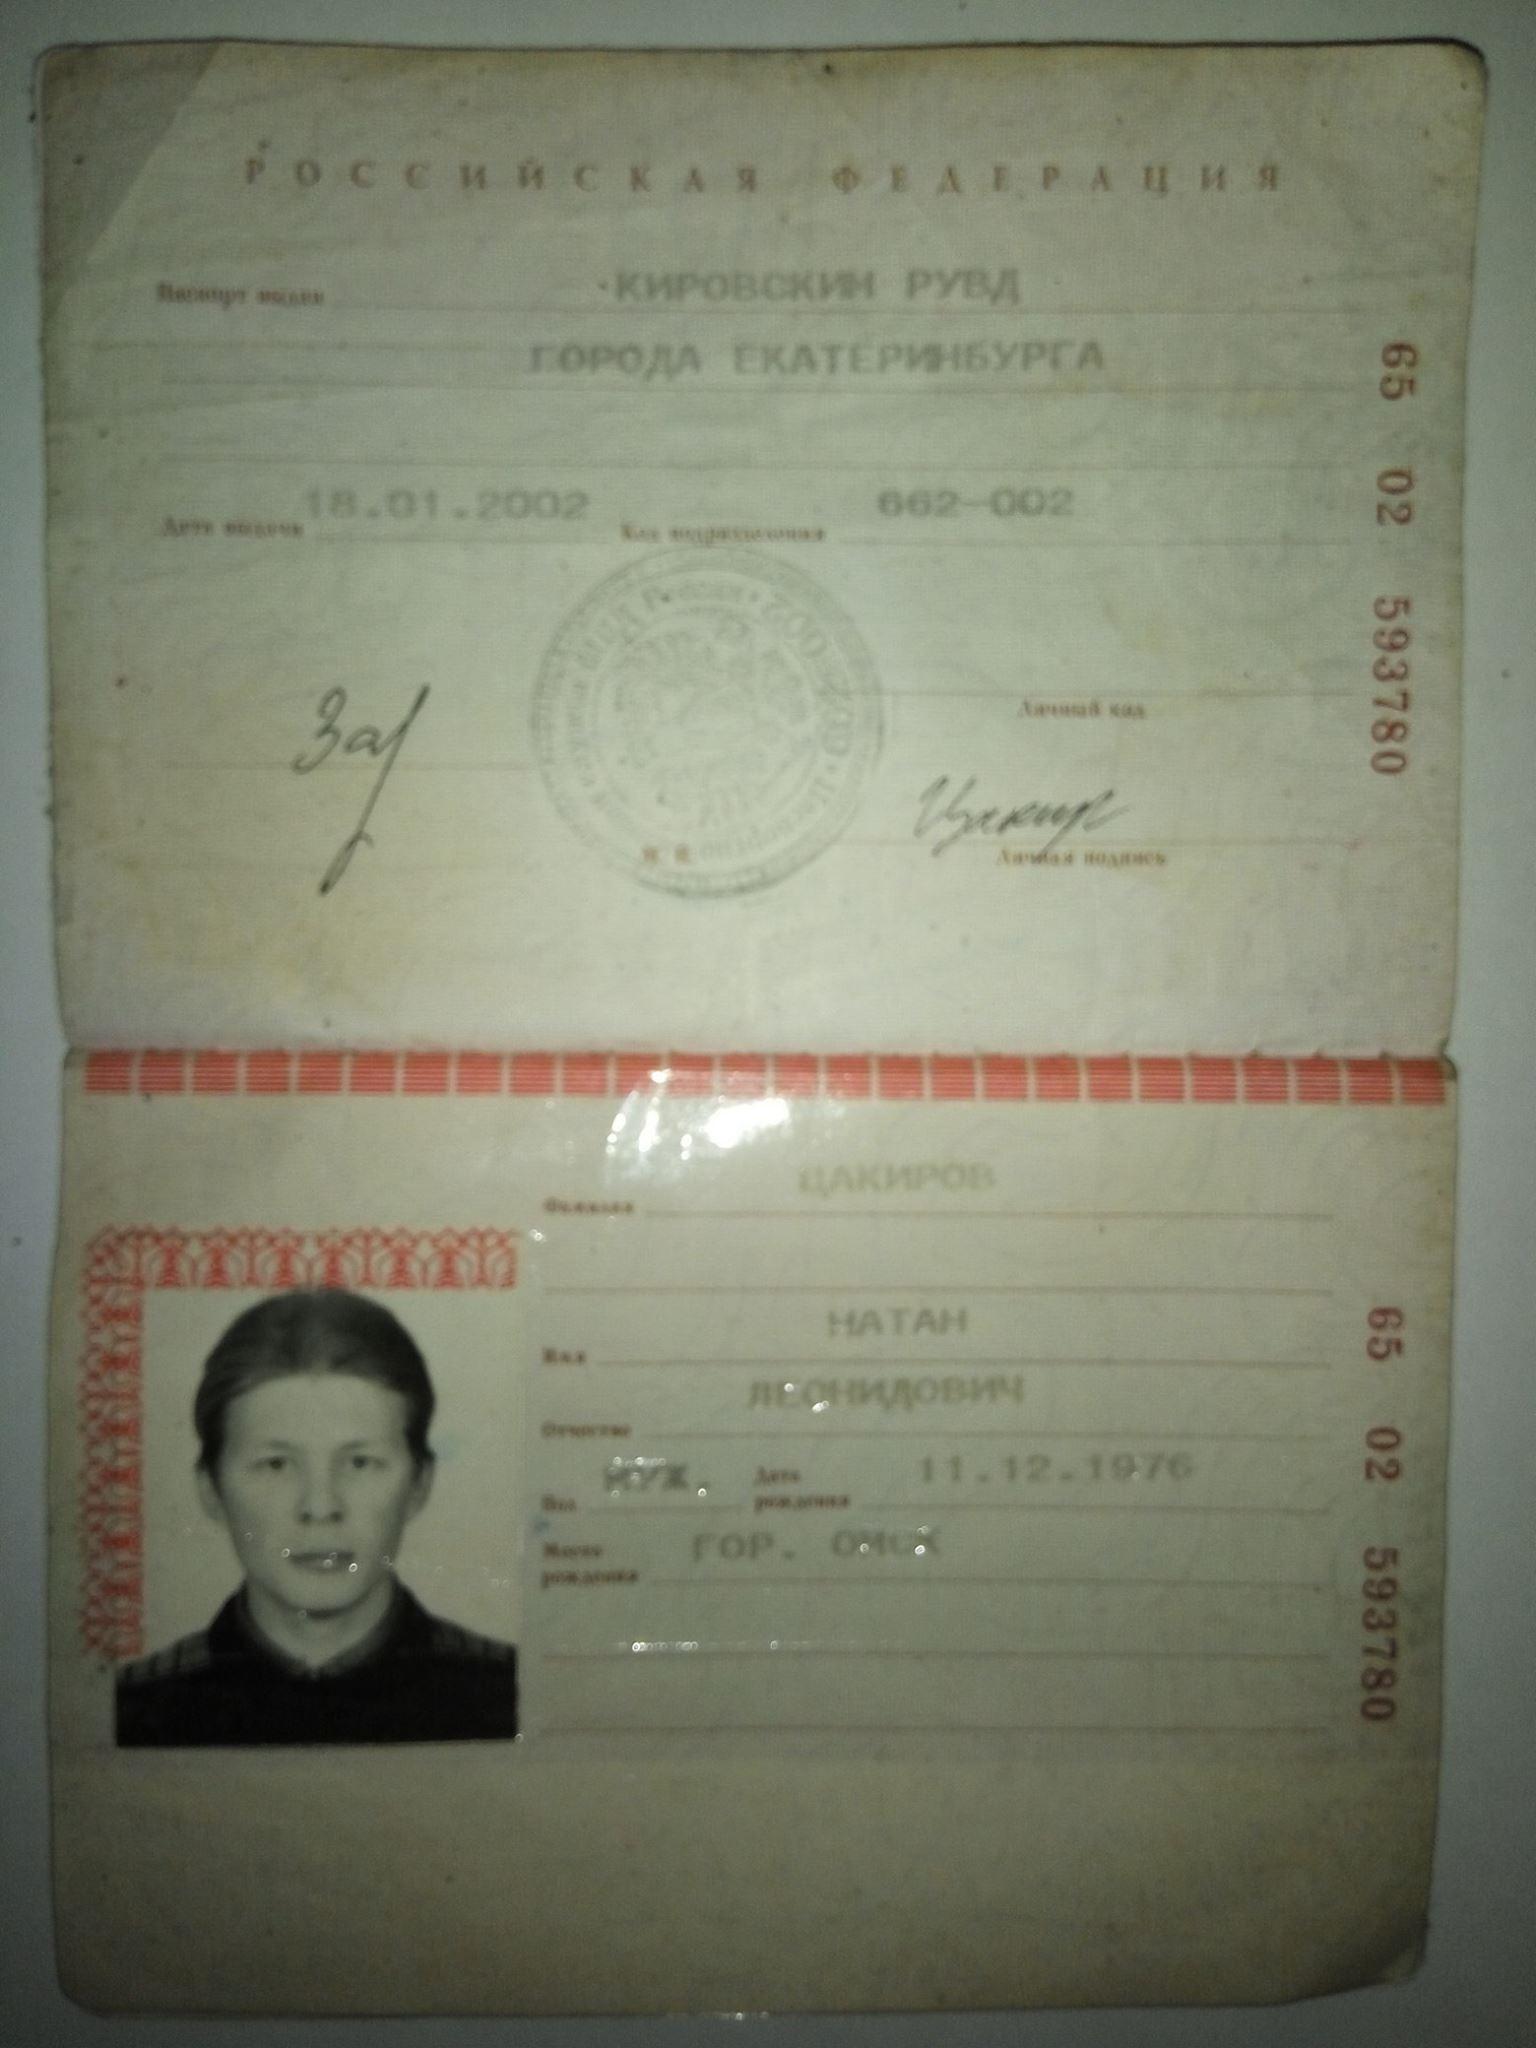 Паспорт РФ-2